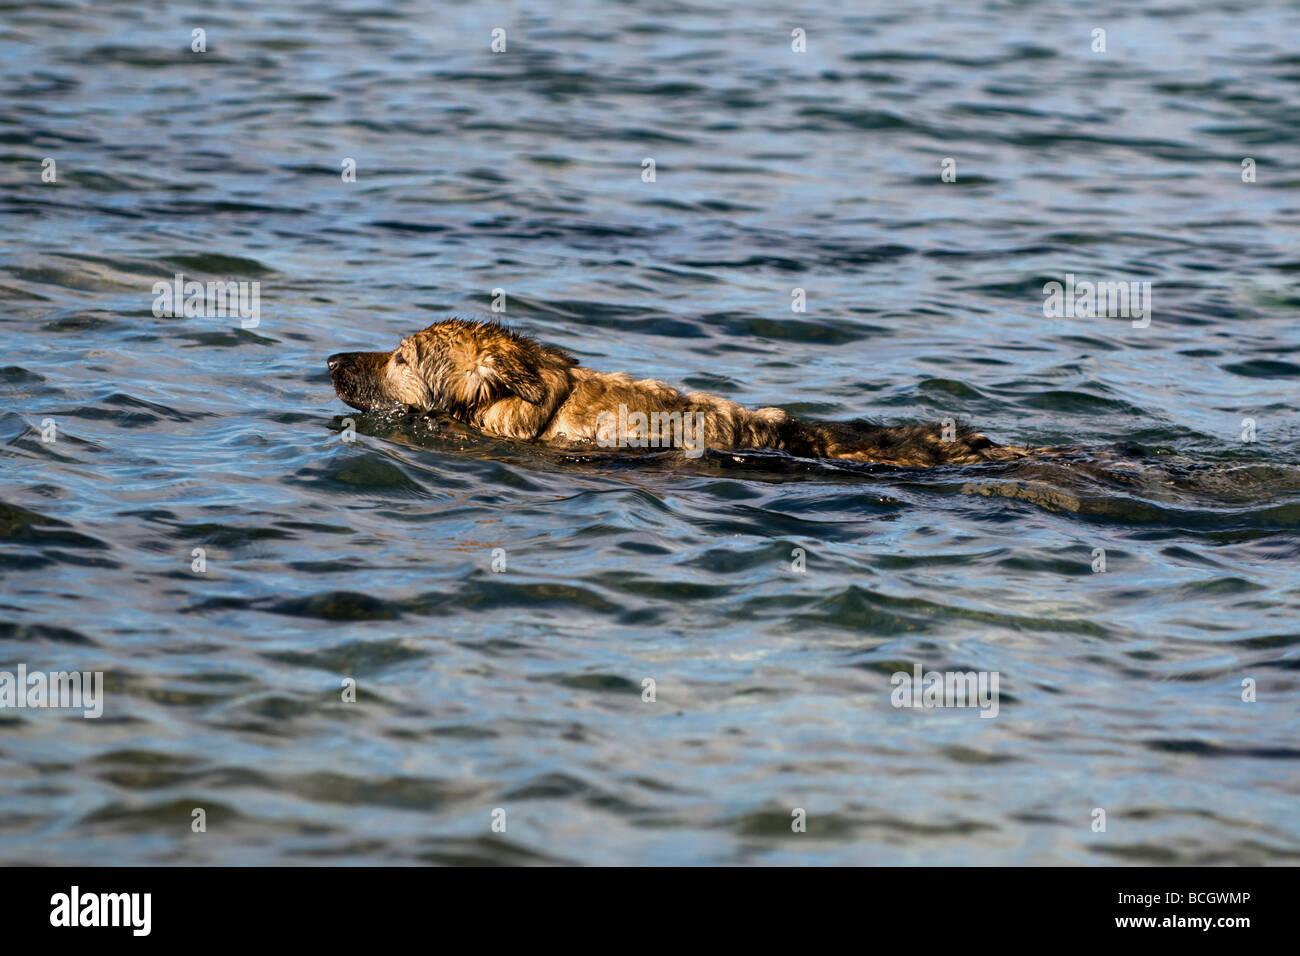 German Shepherd Dog (Alsatian) swimming in Sea at Balnakeil bay, Durness, Sutherland Scotland - Stock Image